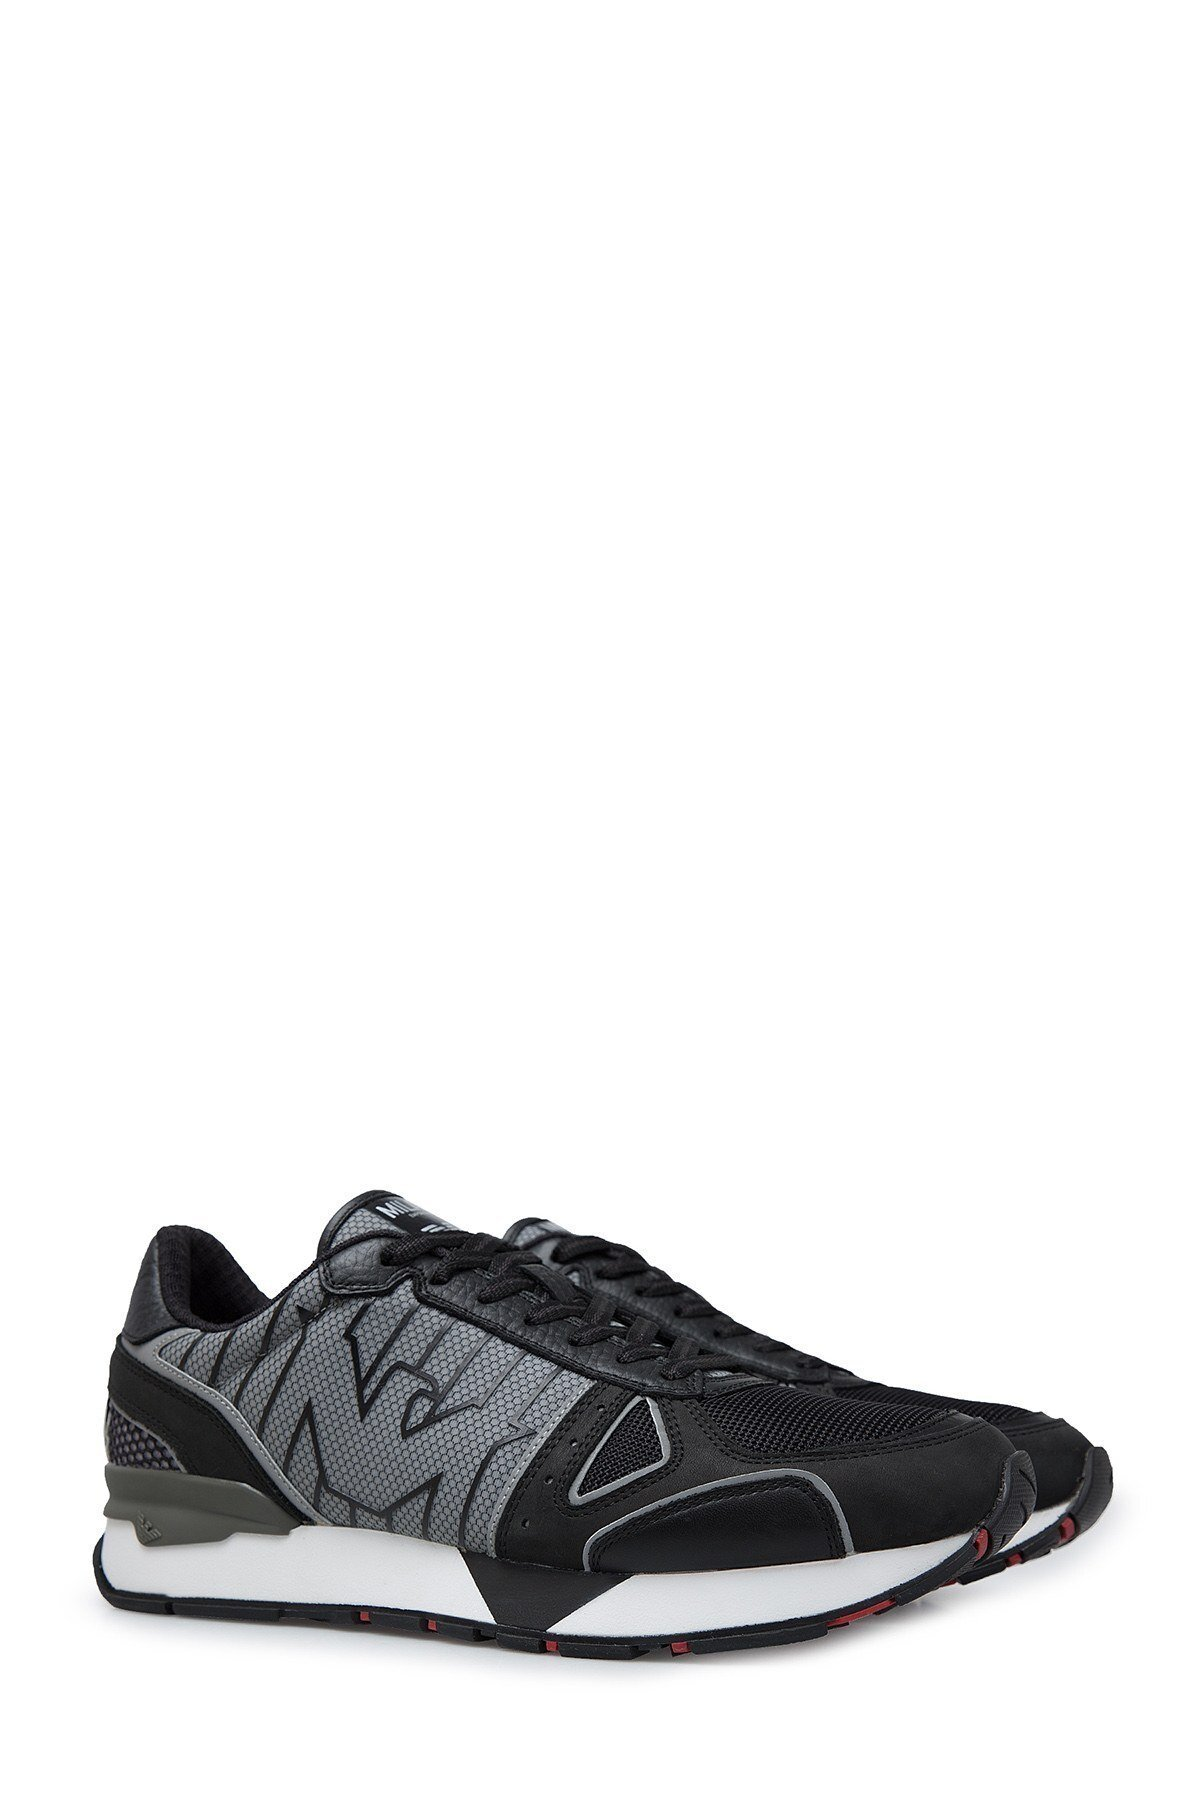 Emporio Armani Erkek Ayakkabı X4X289 XM232 B810 SİYAH-GRİ